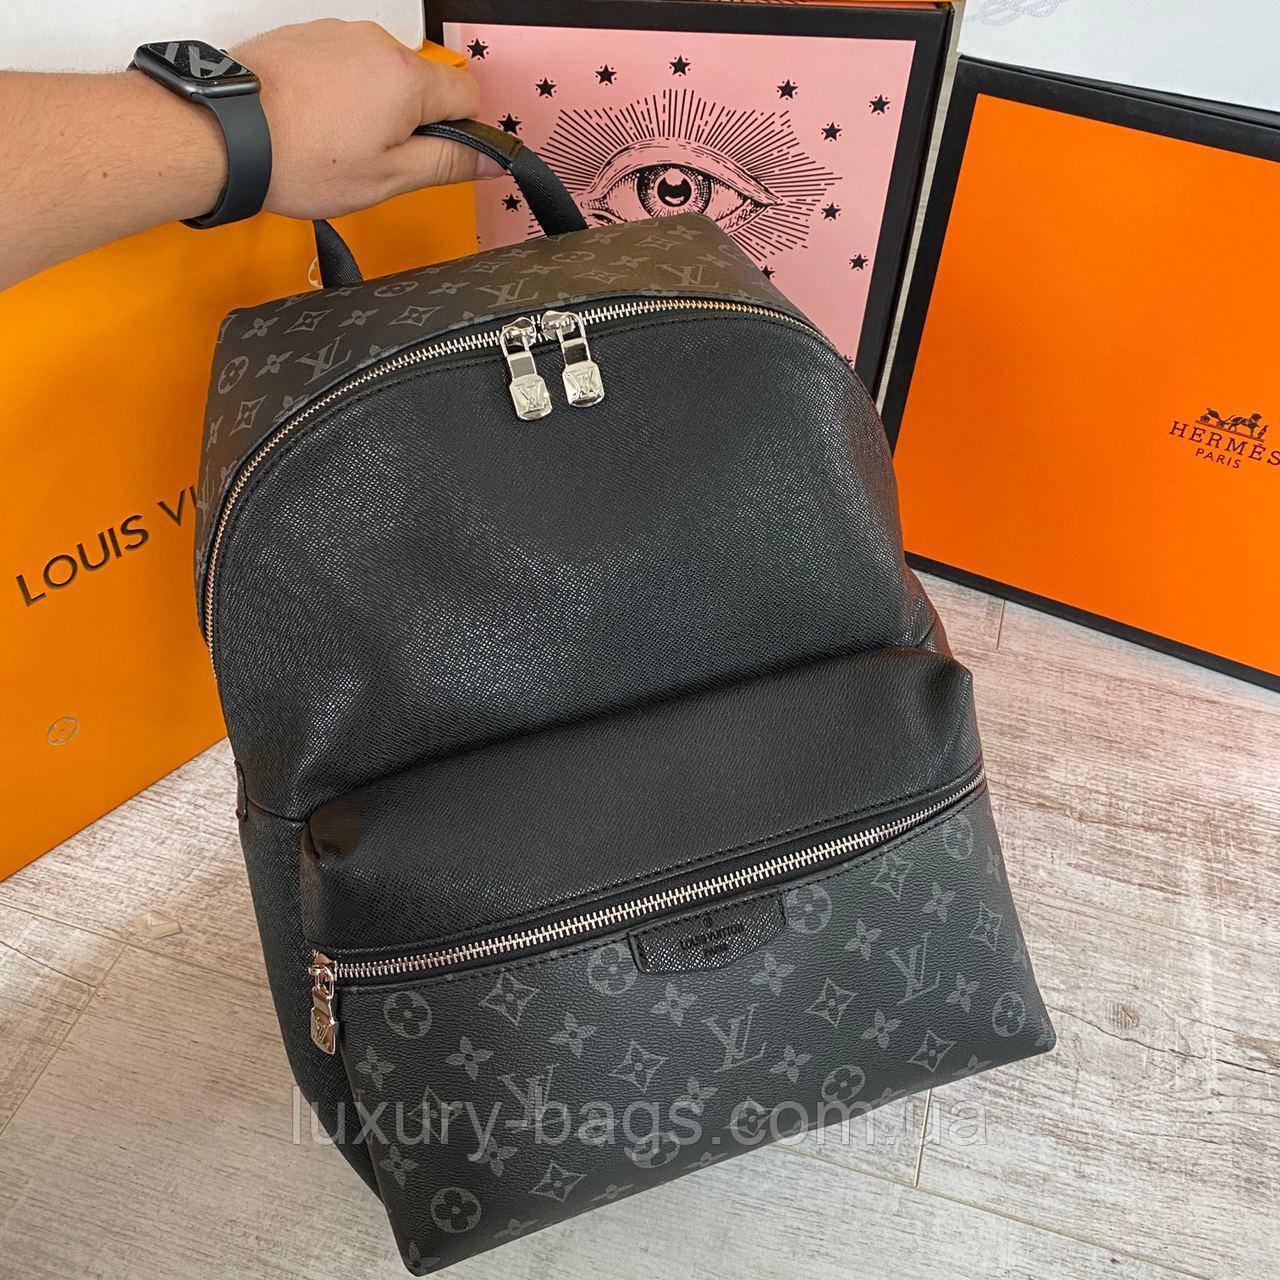 Чоловічий рюкзак Louis Vuitton Discovery